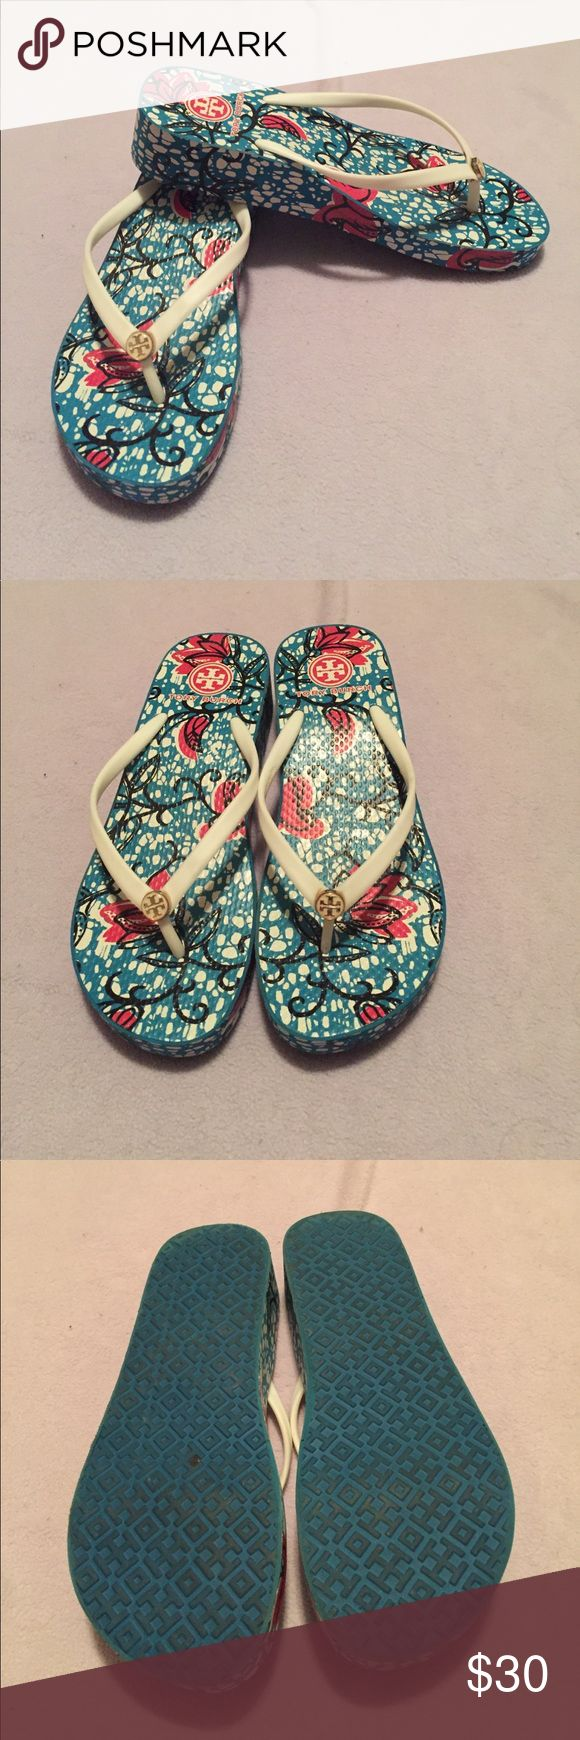 Tory Burch Wedge flip flops size 9 Tory Bur h Wedge flip flops, size 9. Worn once. Tory Burch Shoes Sandals